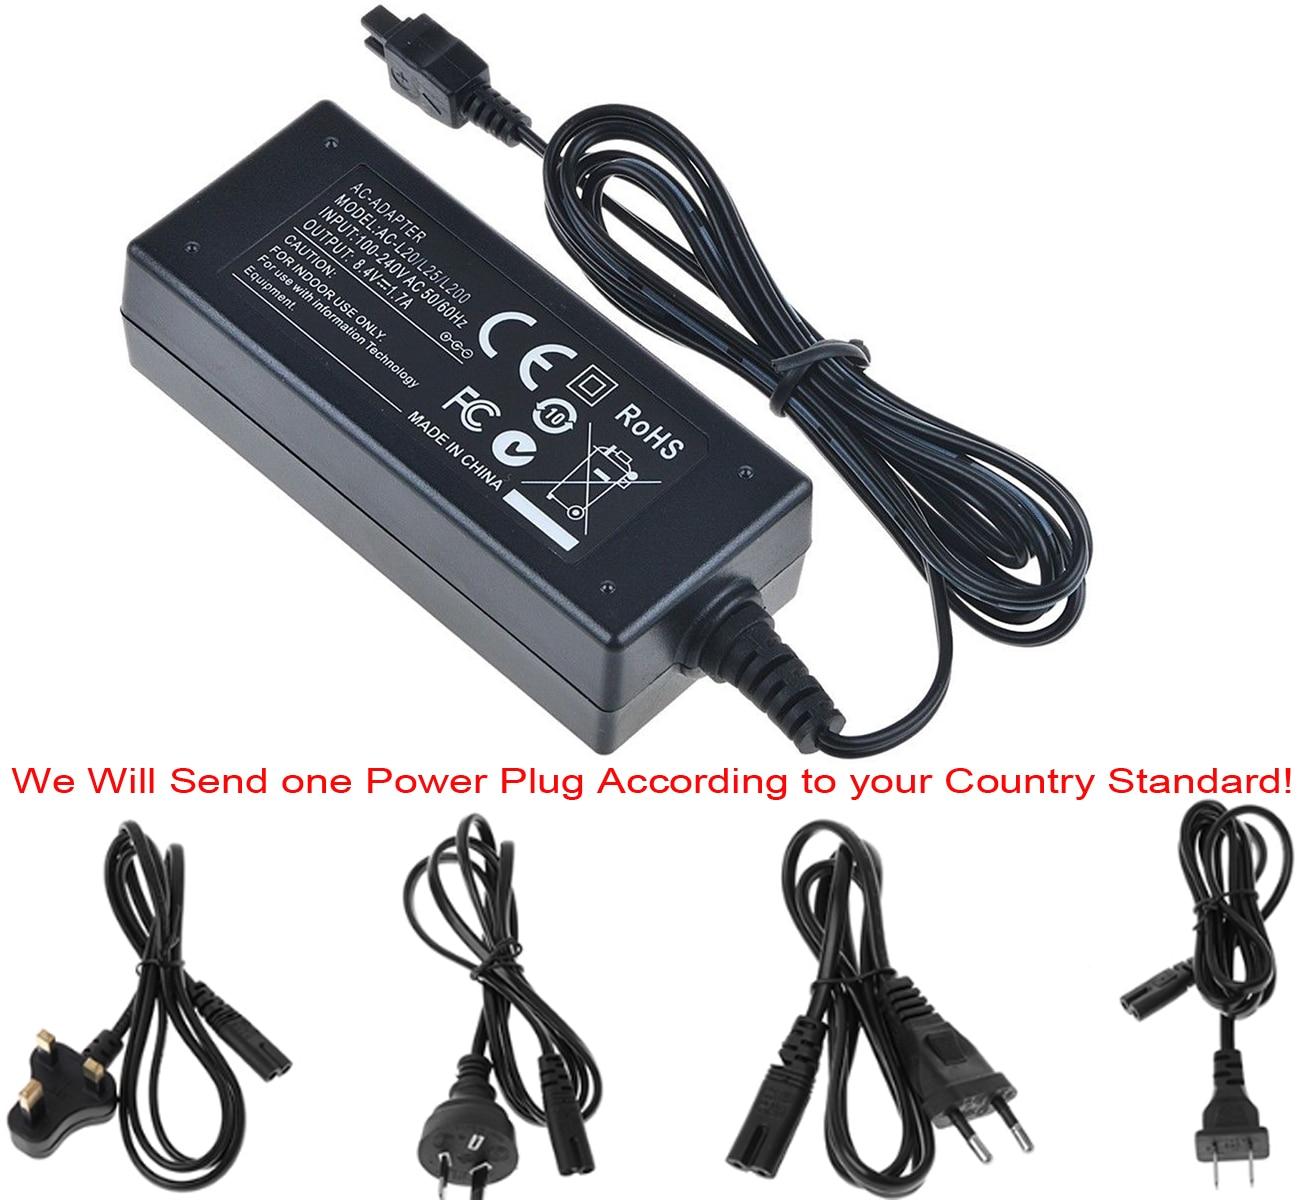 Charger Micro USB for SONY DCR-SR50 SR50E SR52 SR52E SR55